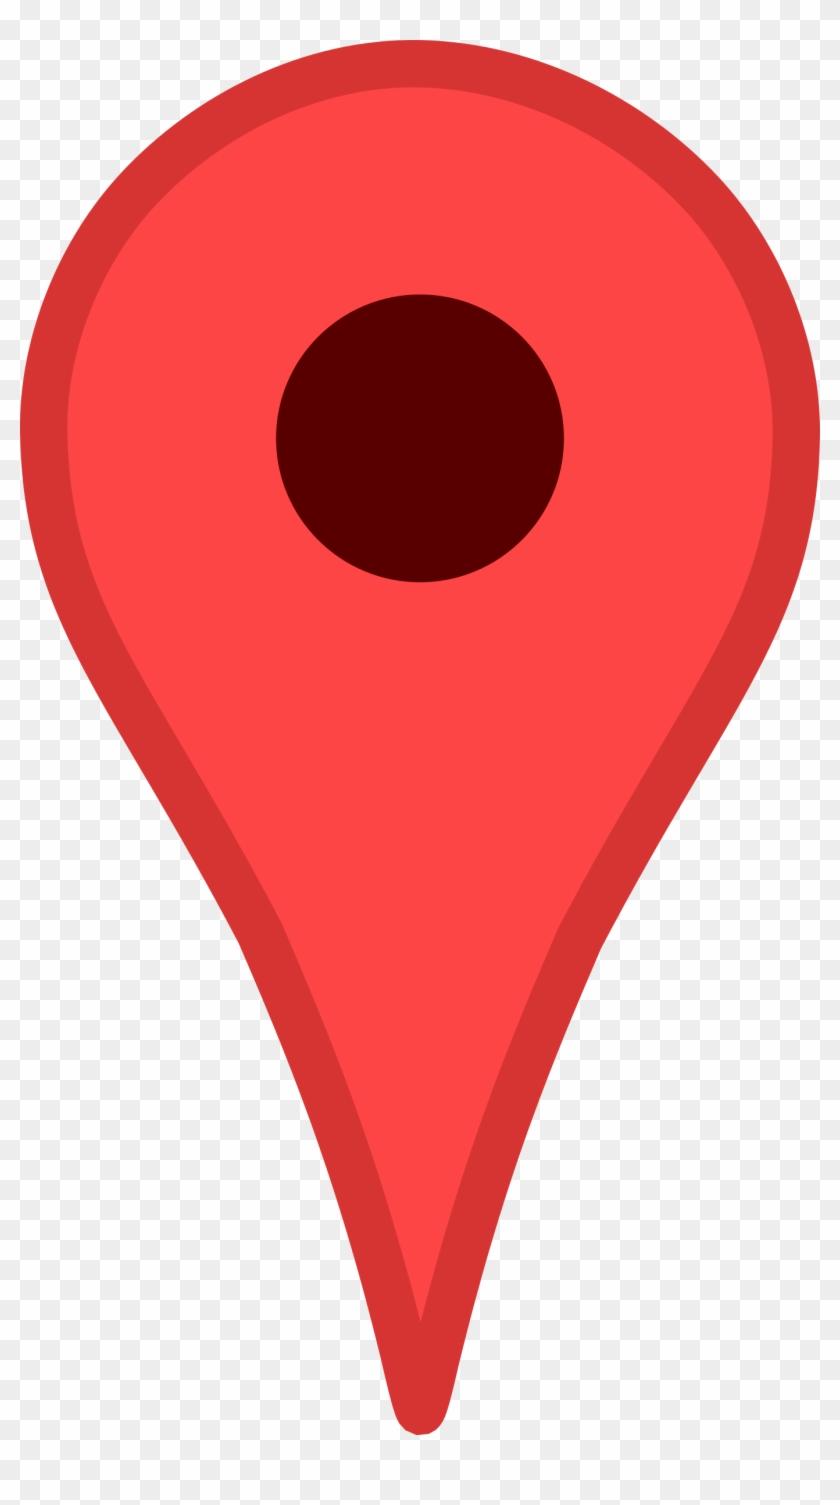 Map Pin Png Pin 2   Google Maps Pin Png   Free Transparent PNG Clipart Images  Map Pin Png